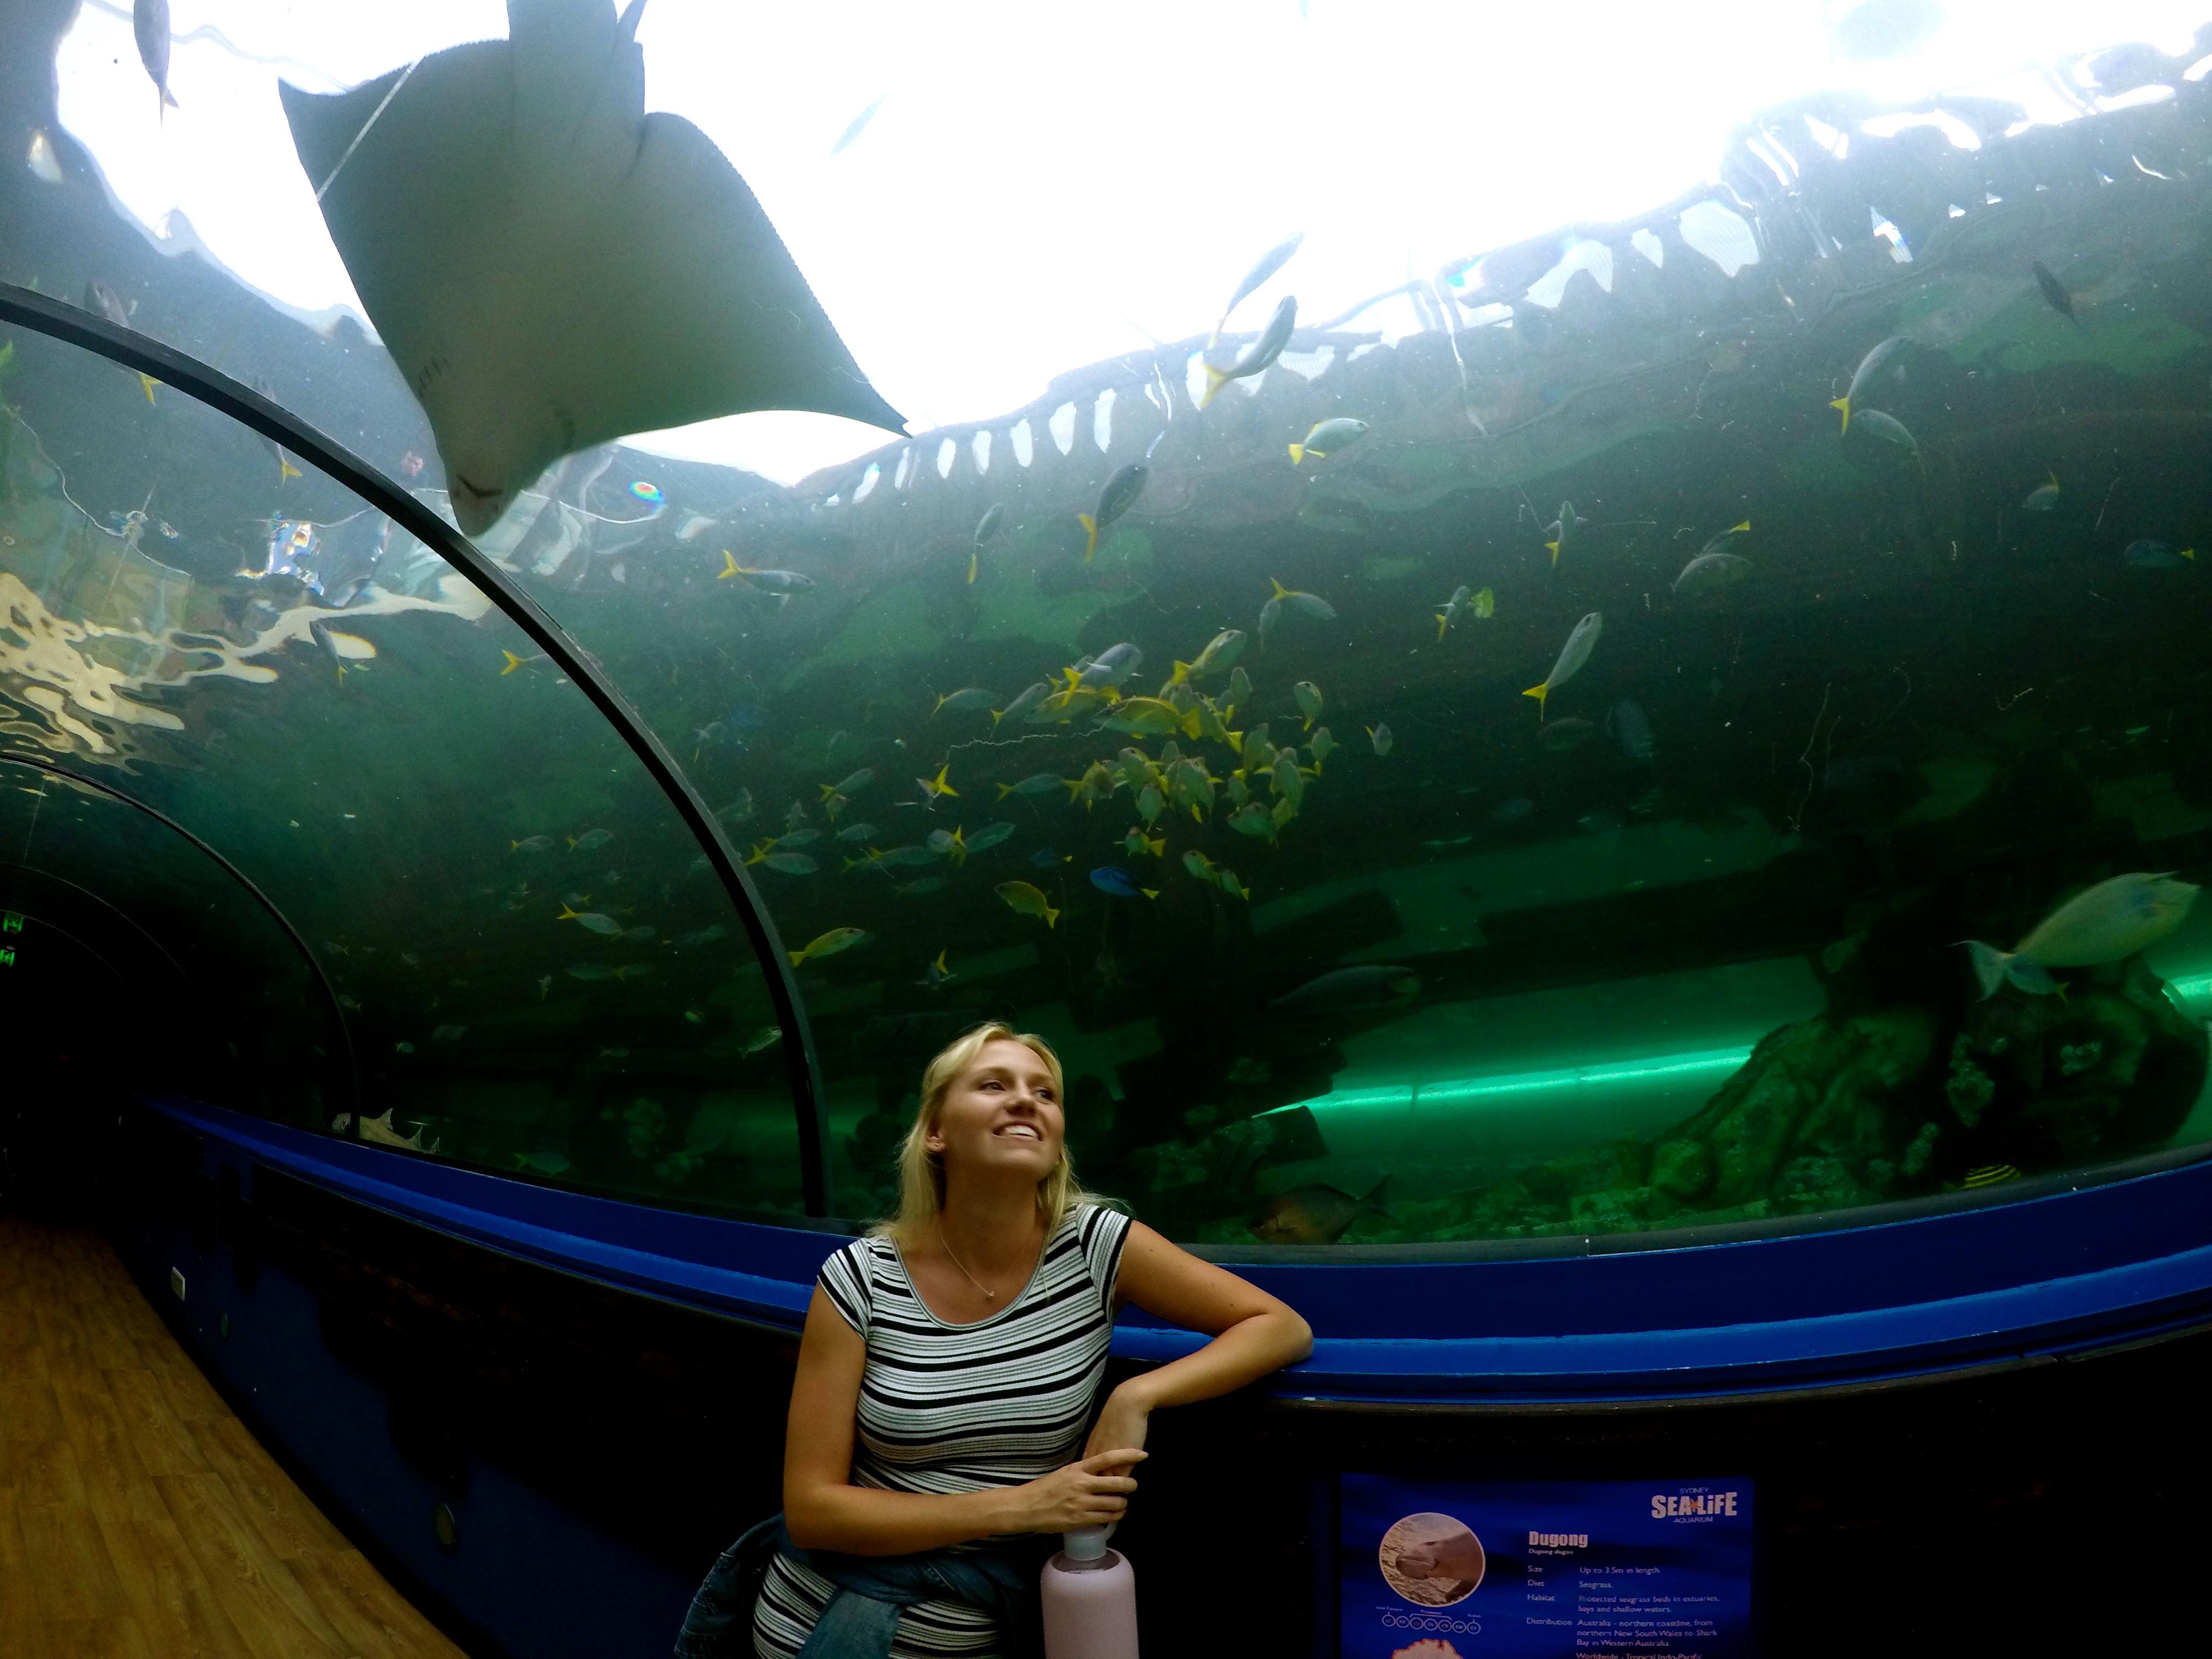 lolFish